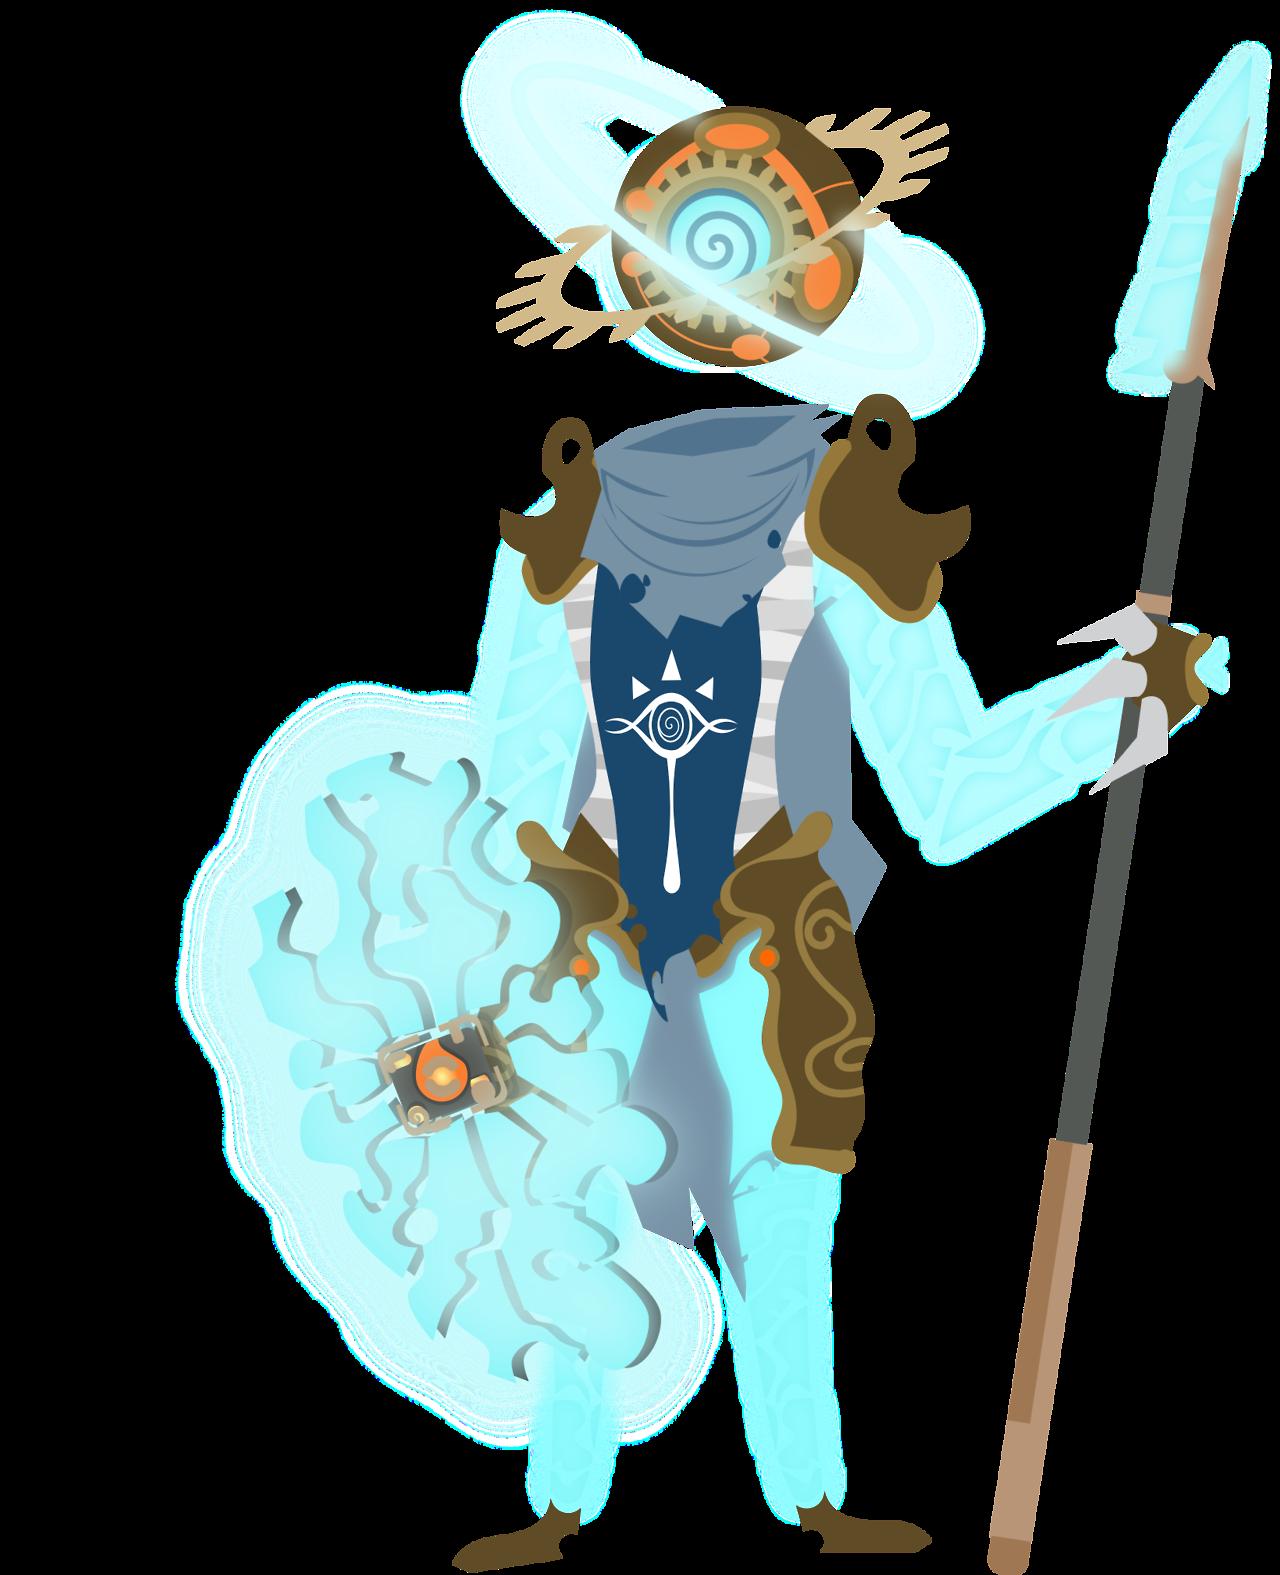 Tumblr Opve8luoqf1vqldoro1 1280 Png 1 280 1 575 Pixels Mythical Pokemon Legend Of Zelda Zelda Art